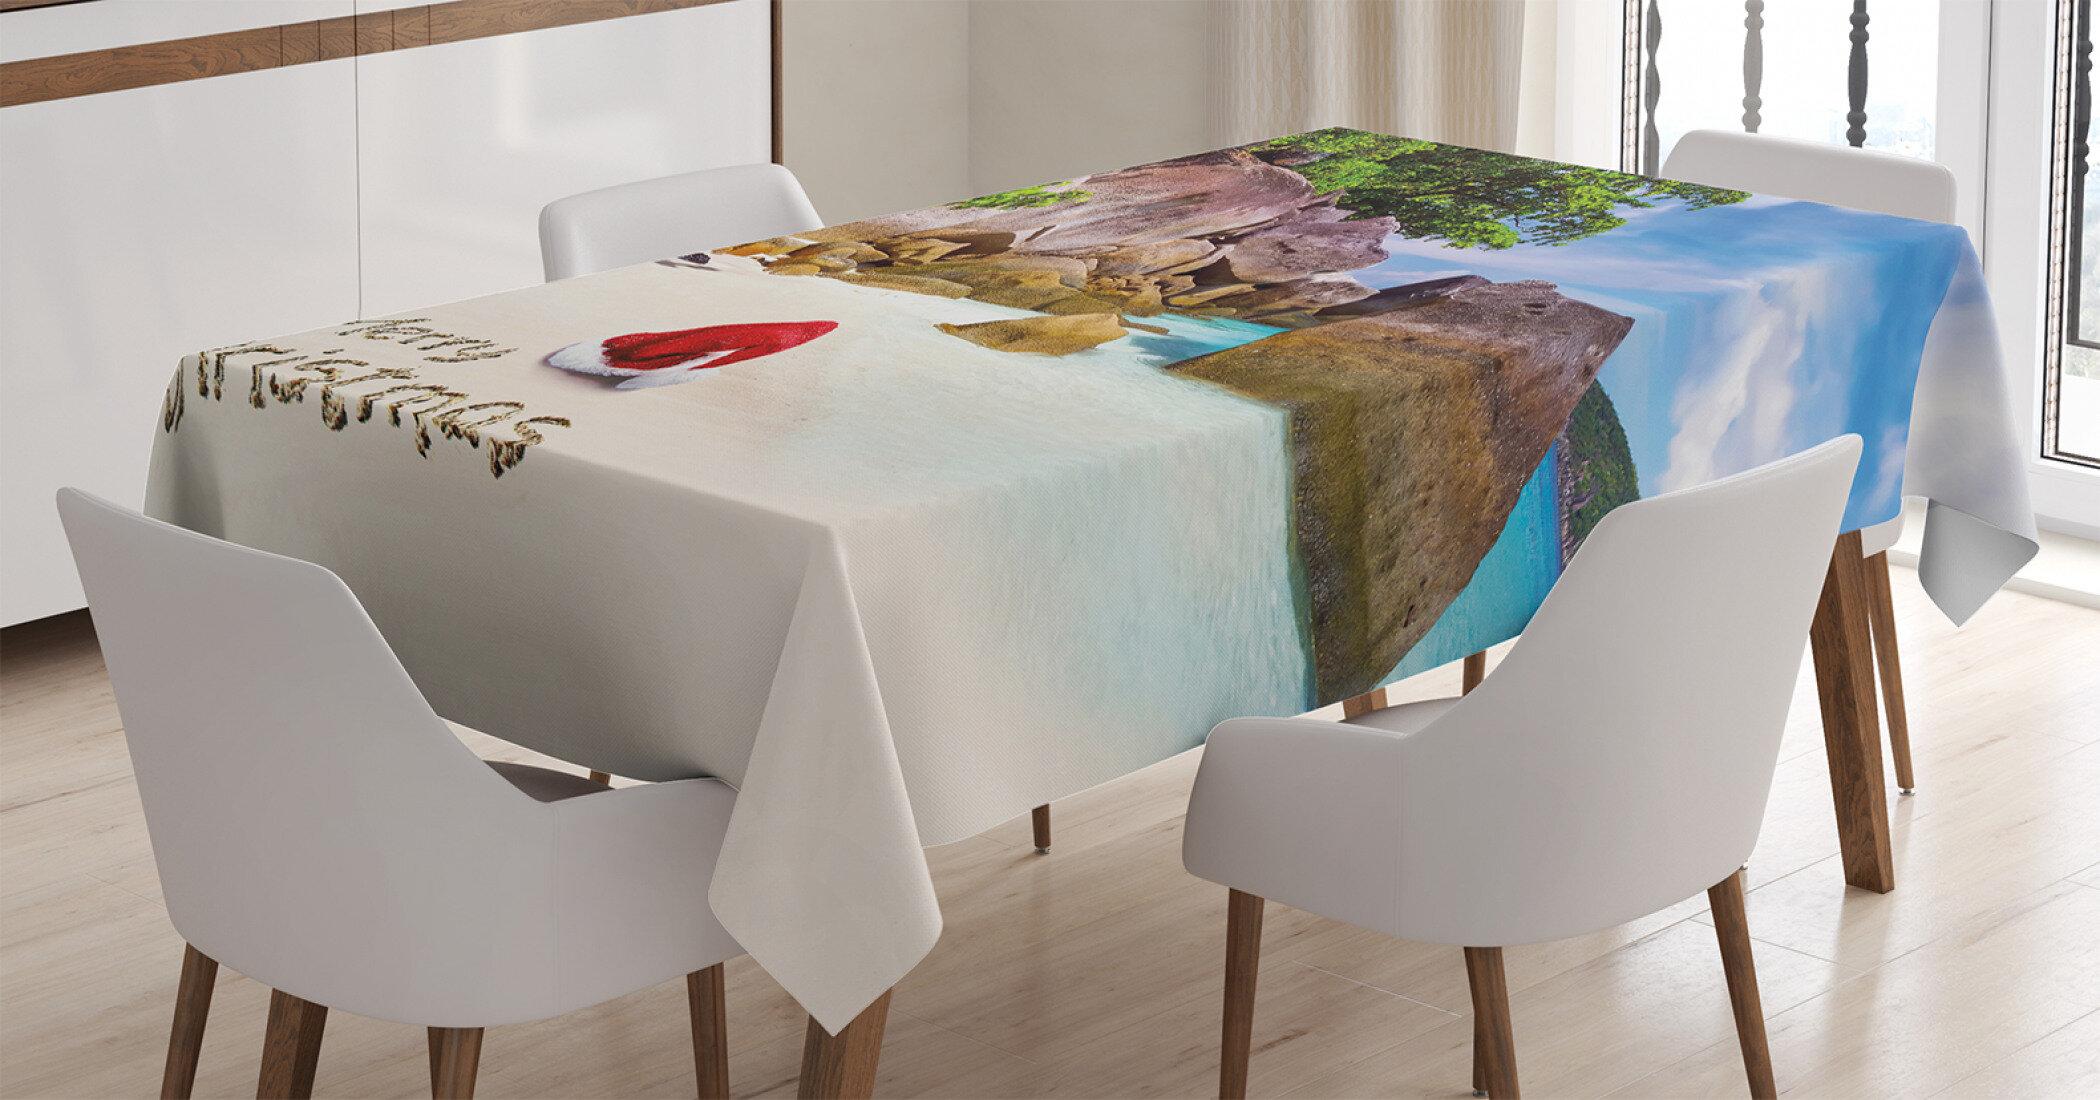 Island Christmas Theme.Ambesonne Christmas Tablecloth Tropical Exotic Island Beach With Big Rocks Idyllic Coastal Charm Theme Print Rectangular Table Cover For Dining Room